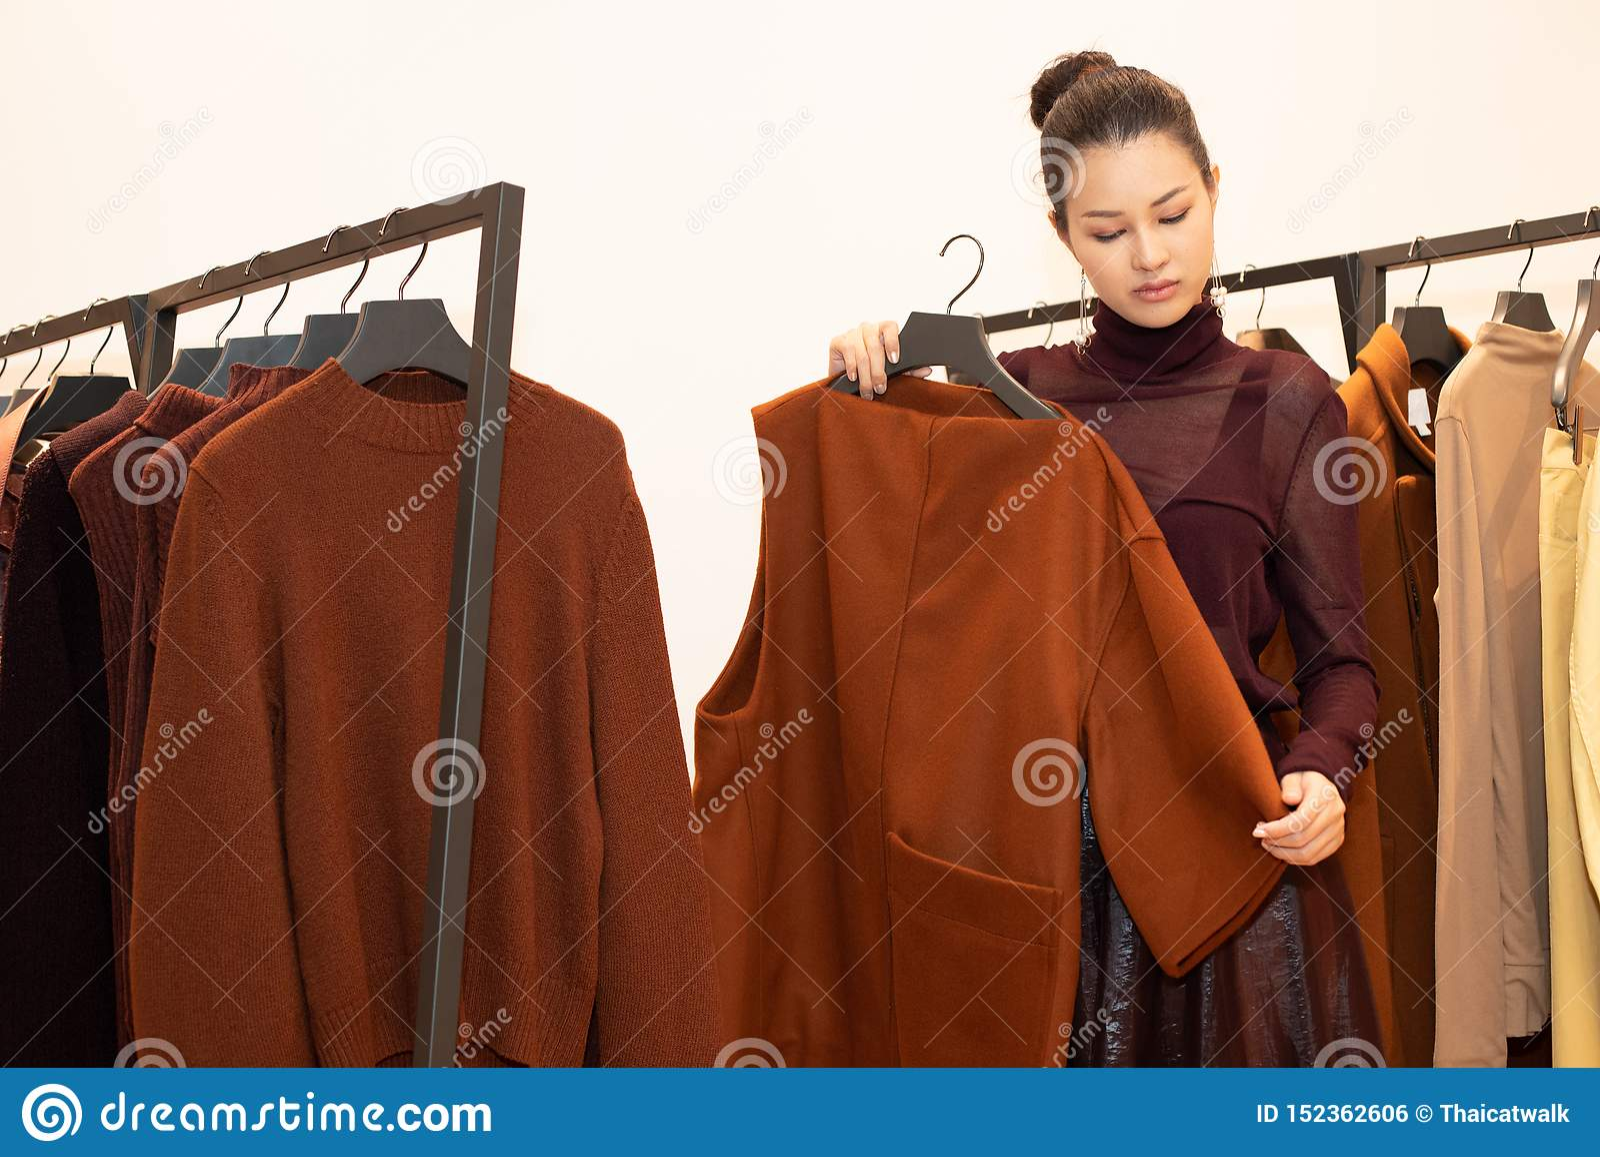 Vrouw in kledings uitgezochte nieuwe inzameling op rek